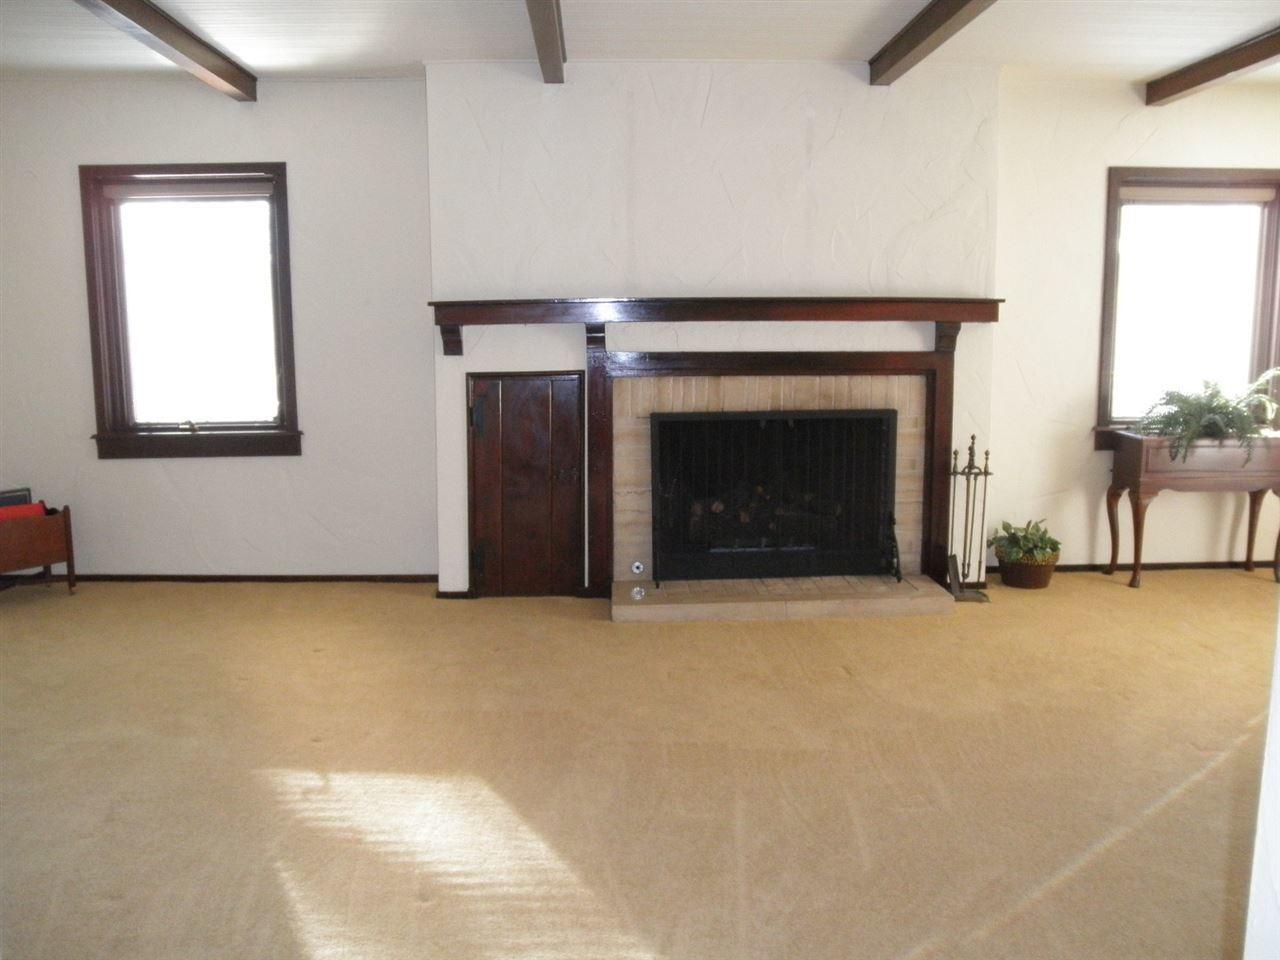 Sold Cross Sale W/ MLS | 88 Elmwood  Ponca City, OK 74601 9